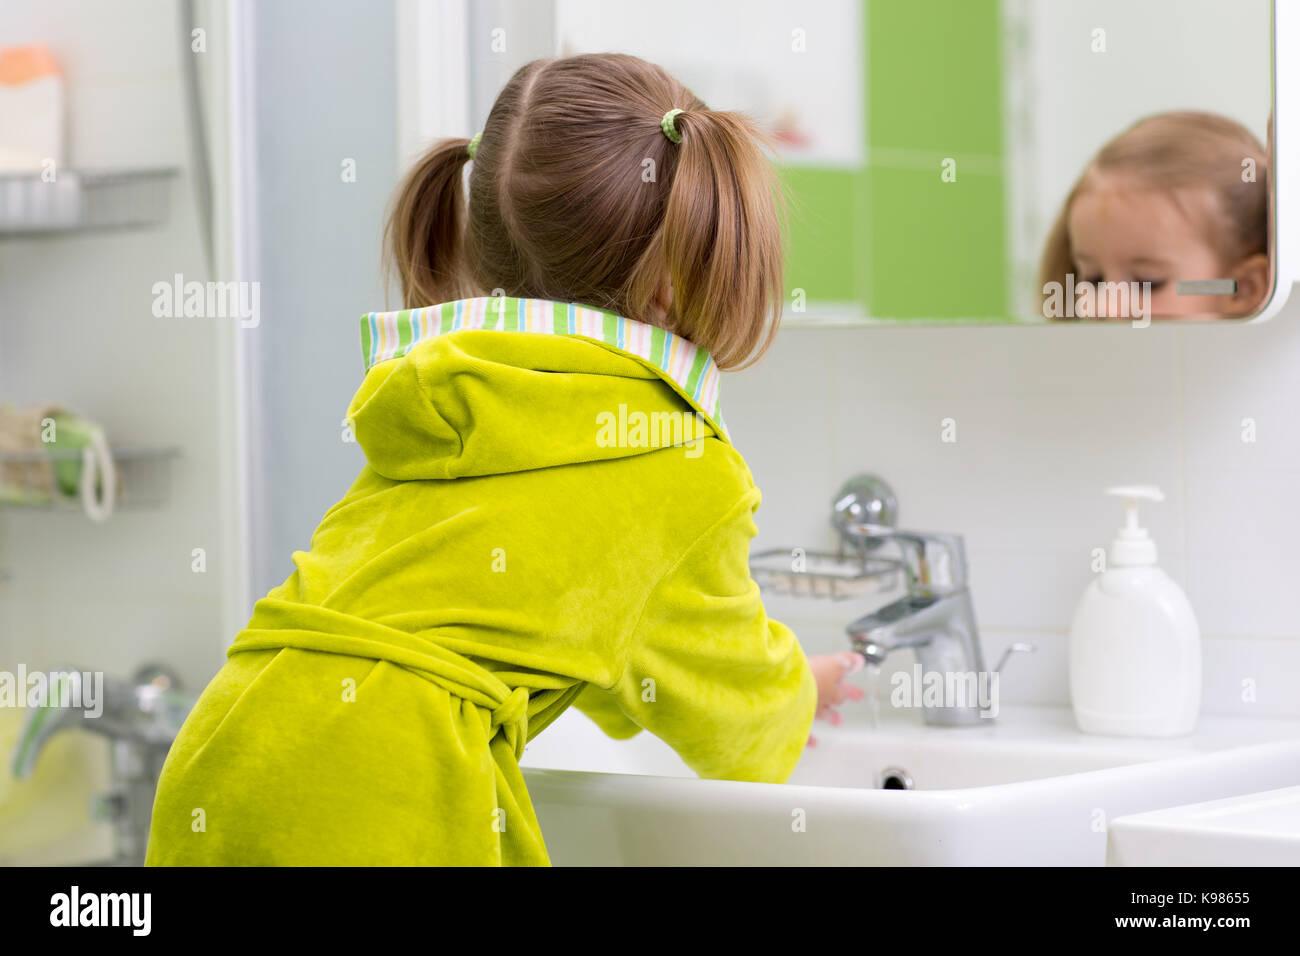 Little girl washing hands in bathroom - Stock Image